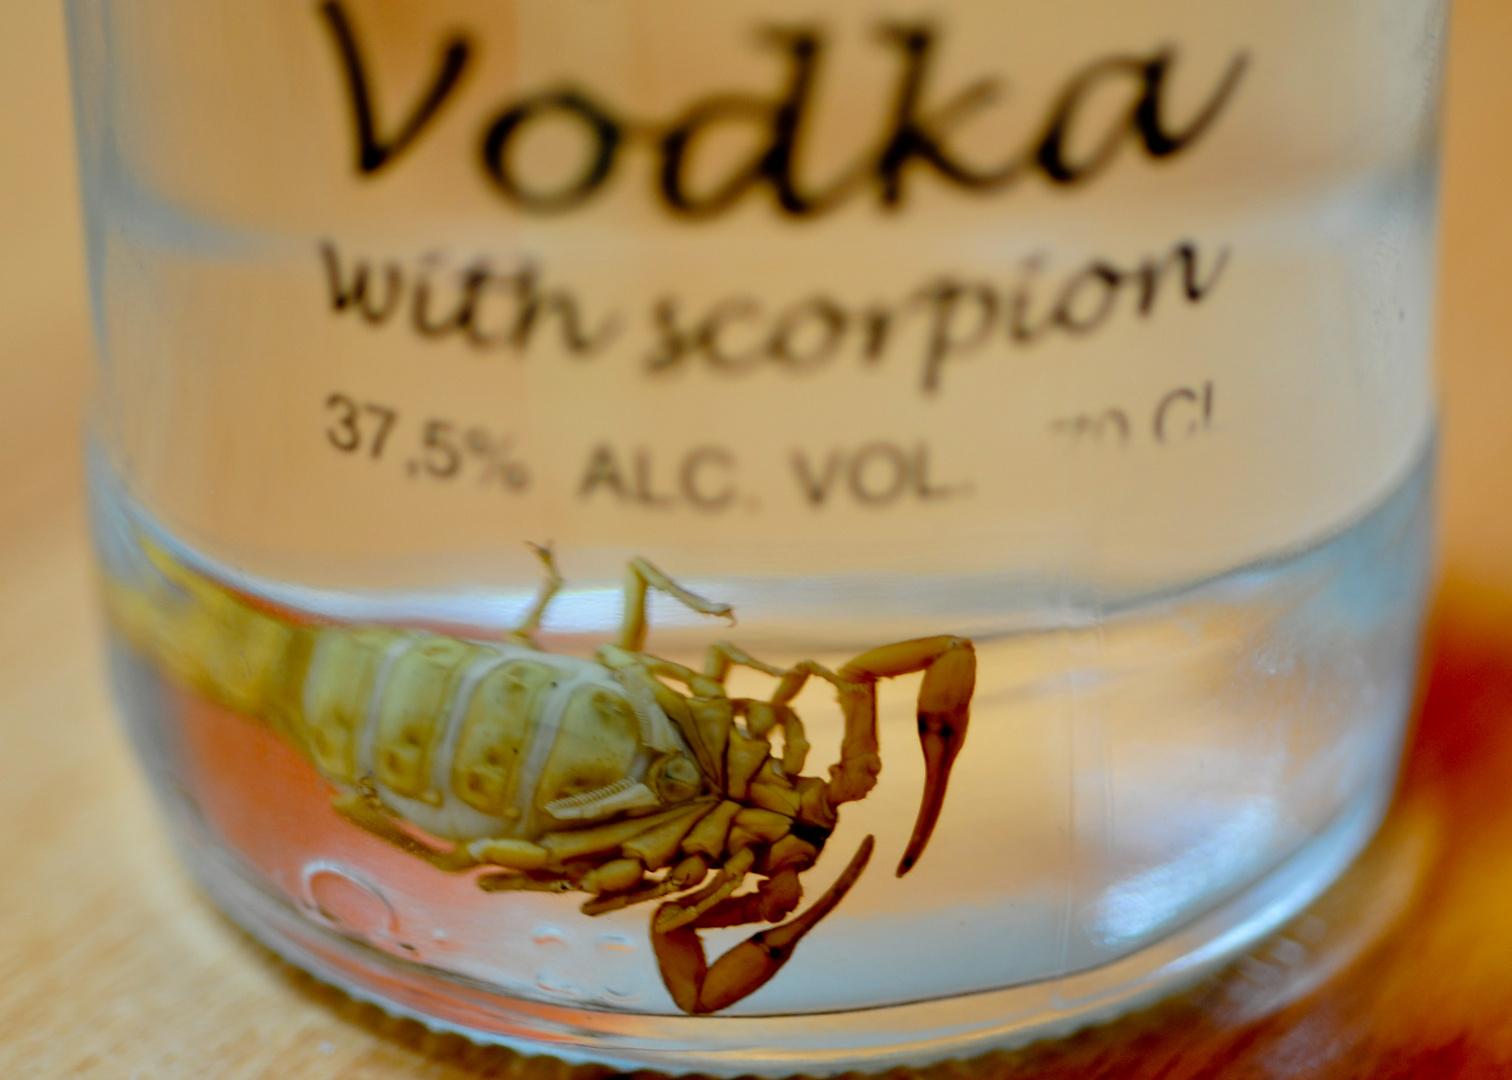 Der ertrunkene Scorpion